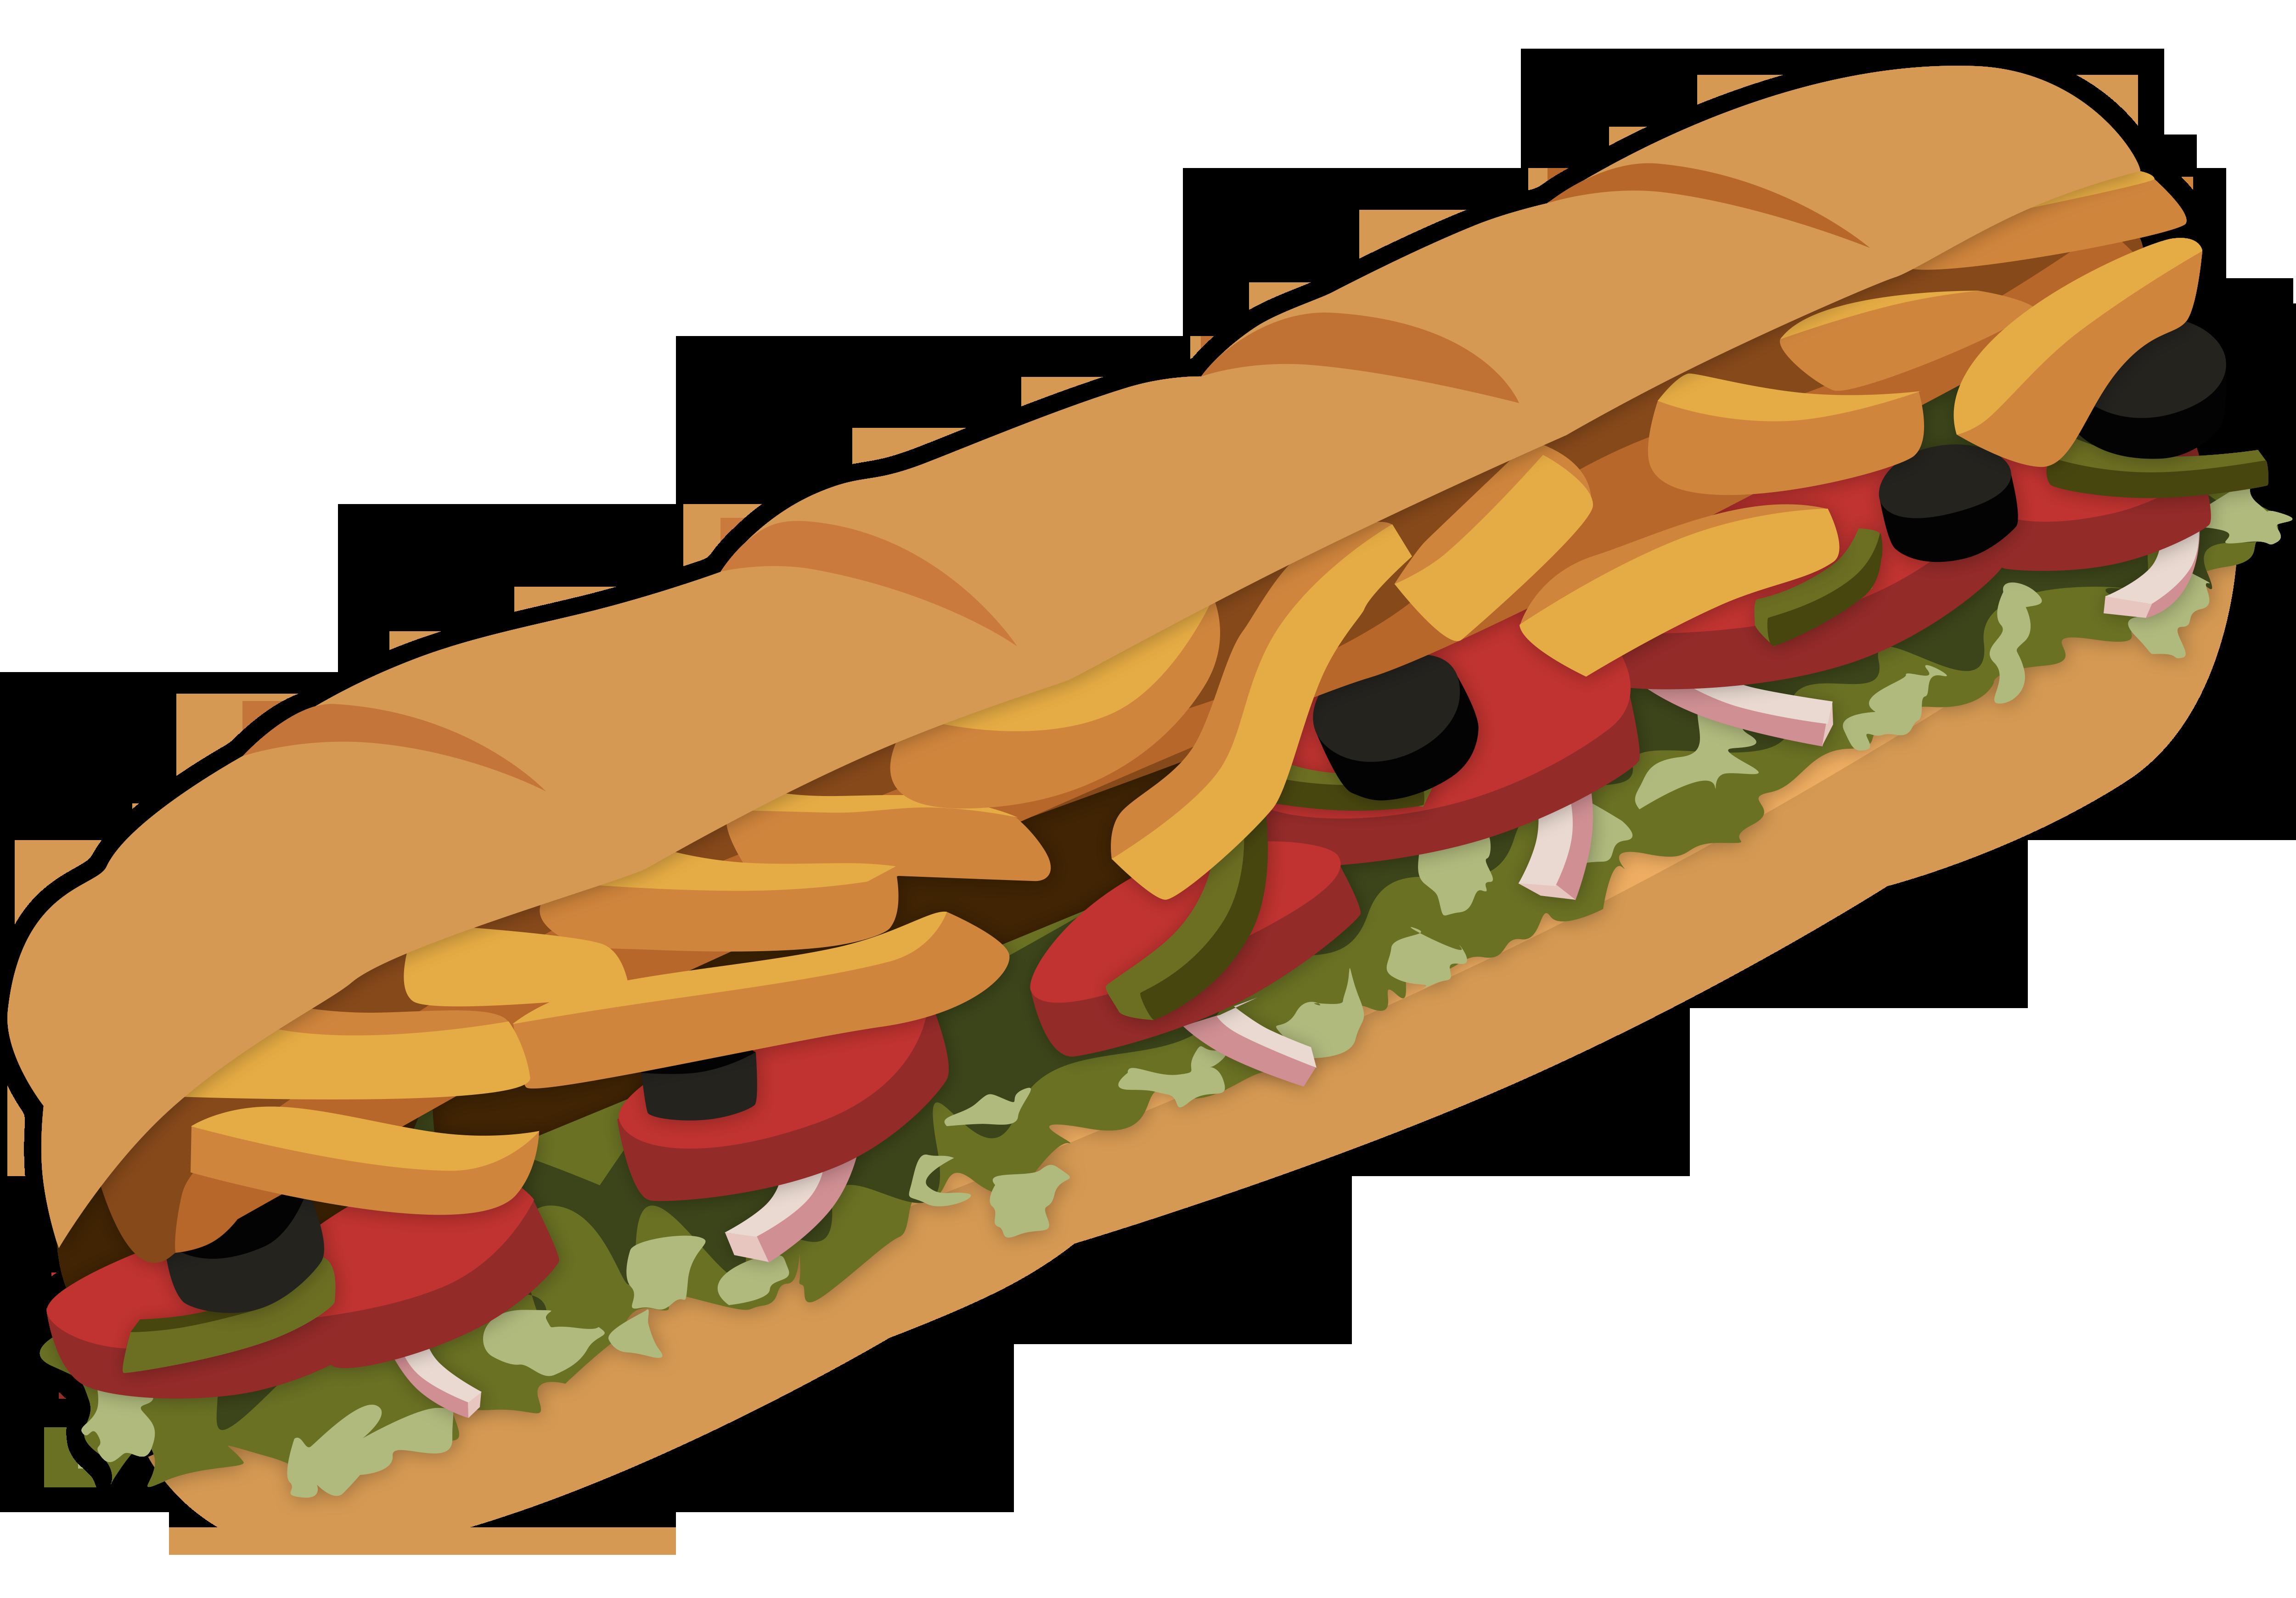 Submarine clipart transparent background. Cartoon sub sandwich free